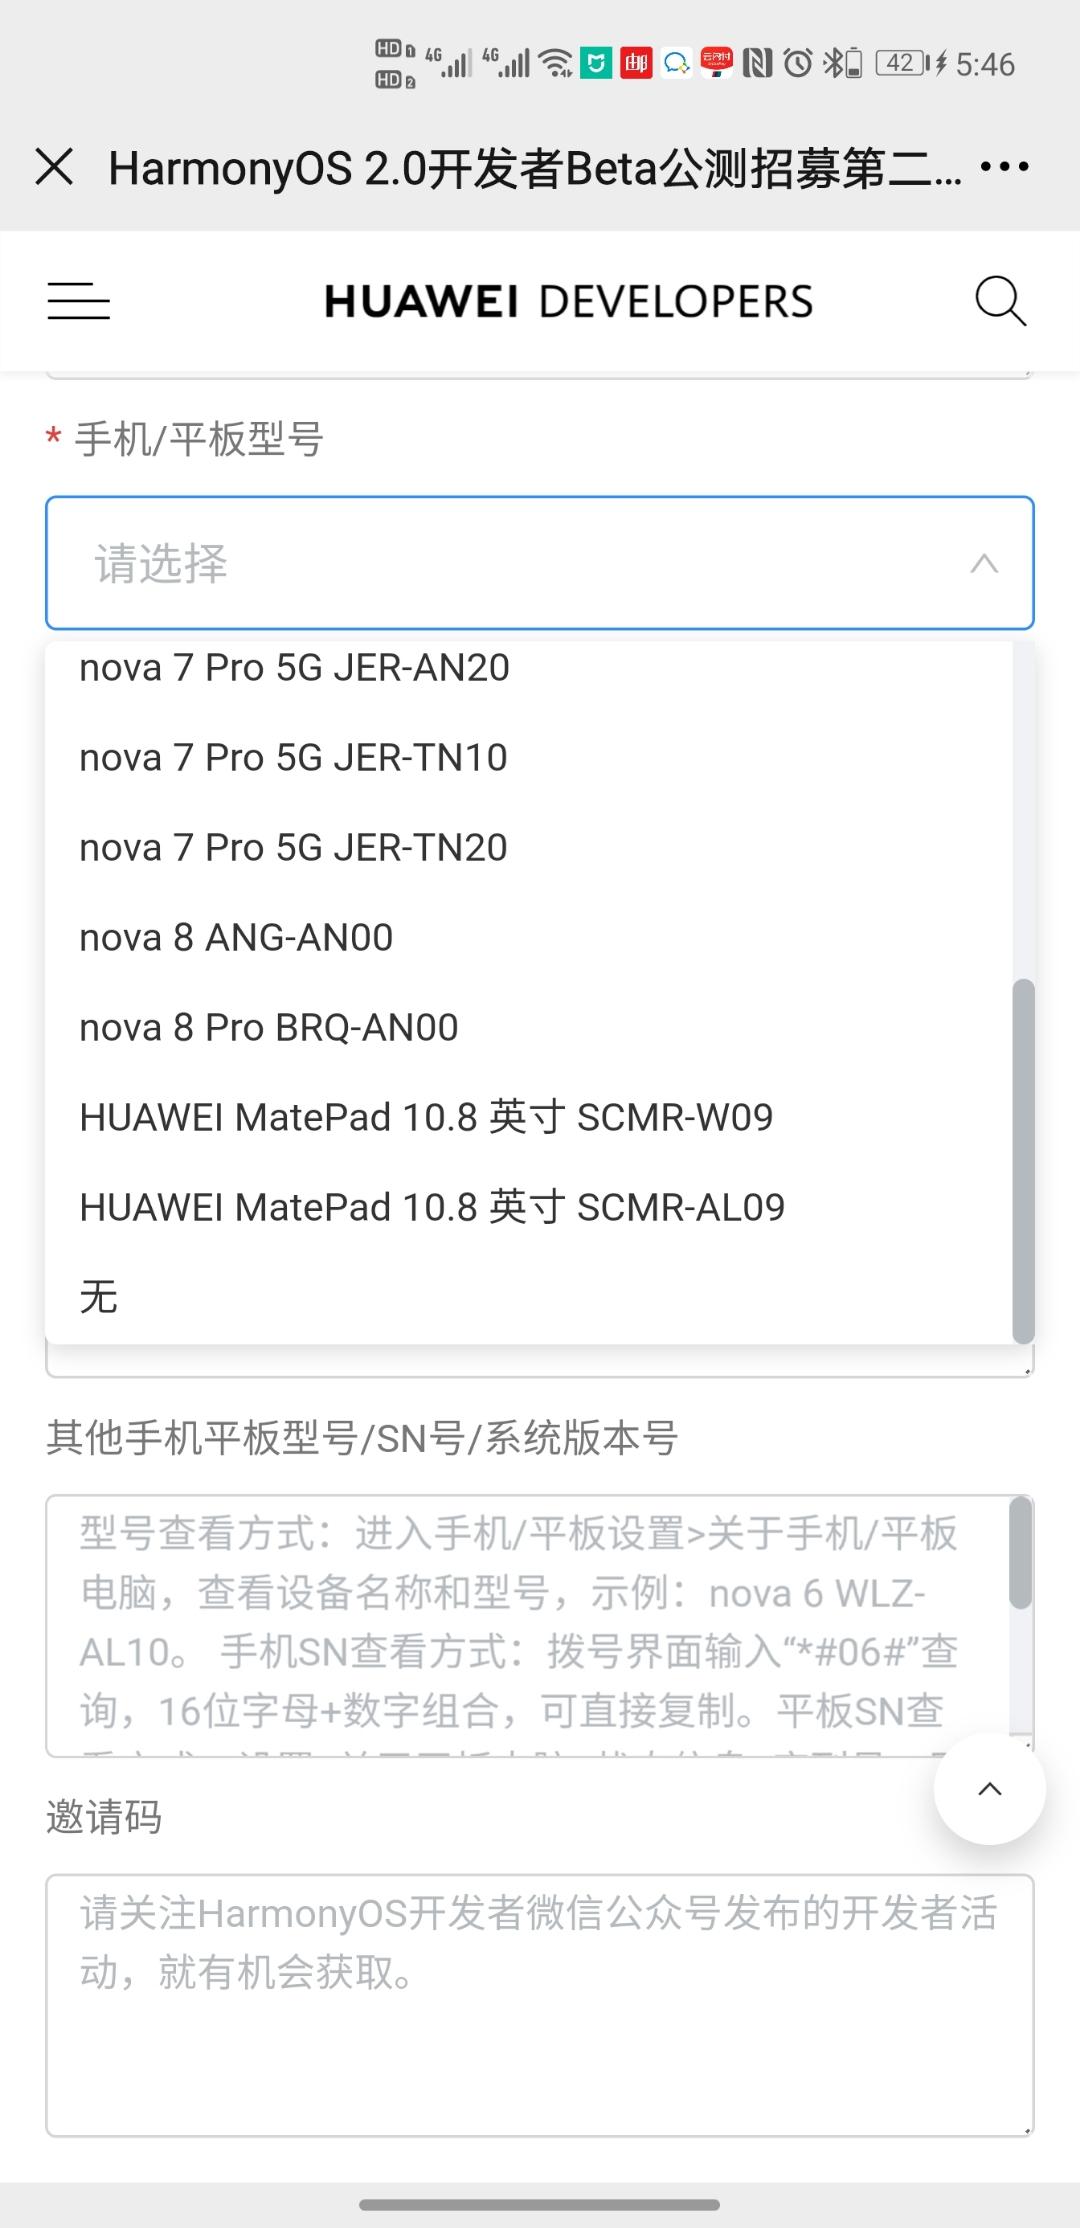 Screenshot_20210510_174630_com.tencent.mm.jpg